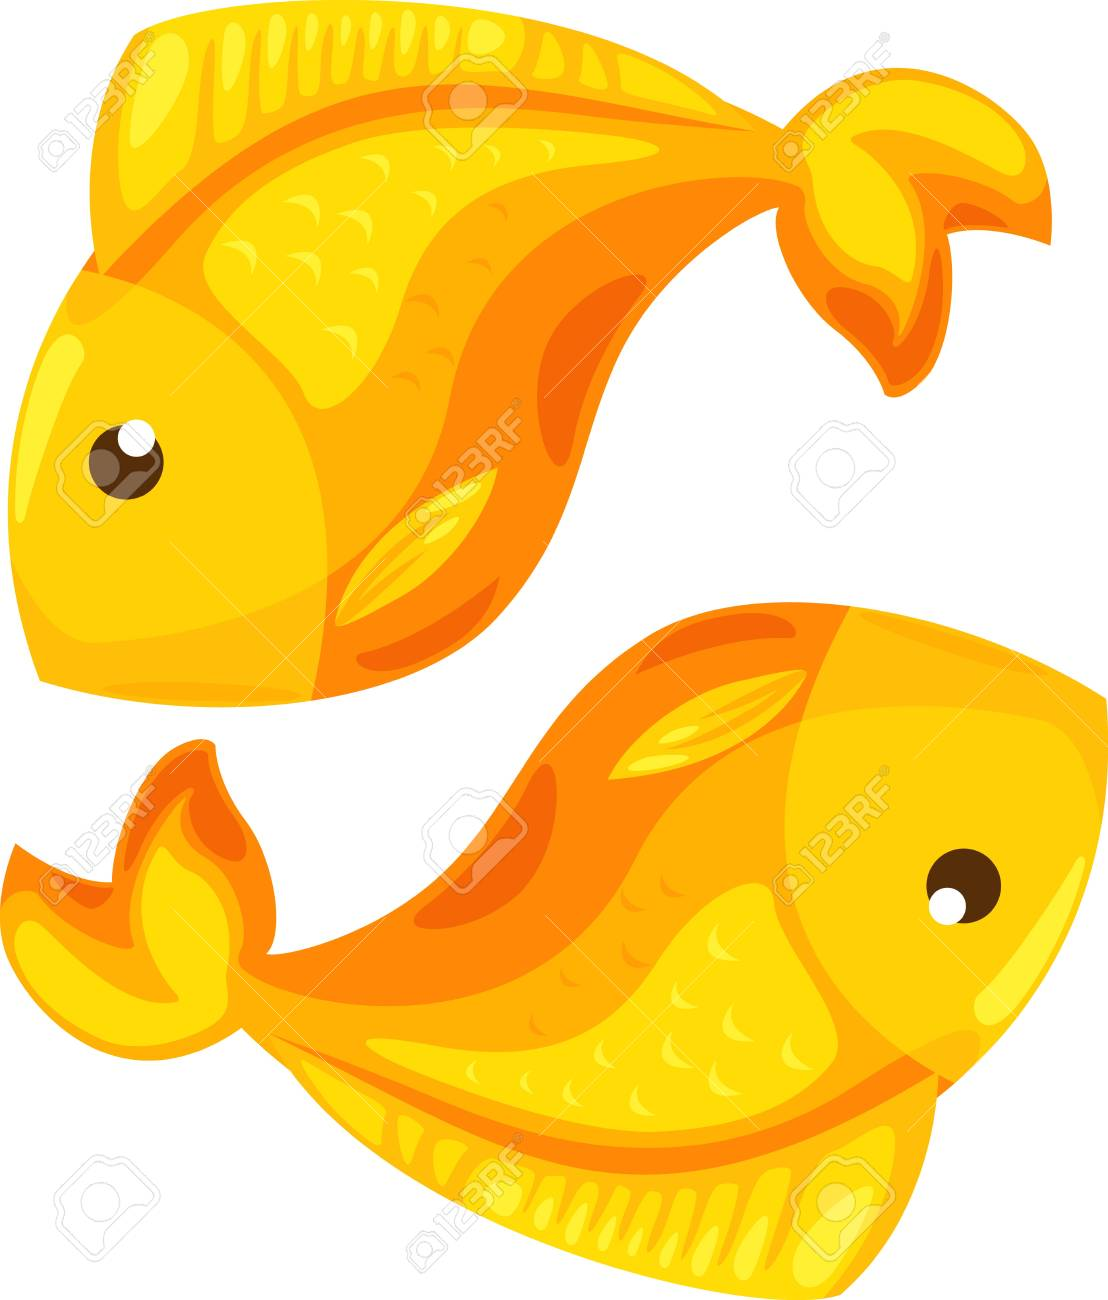 Zodiac signs - Pisces icon Illustration Stock Vector - 16857875